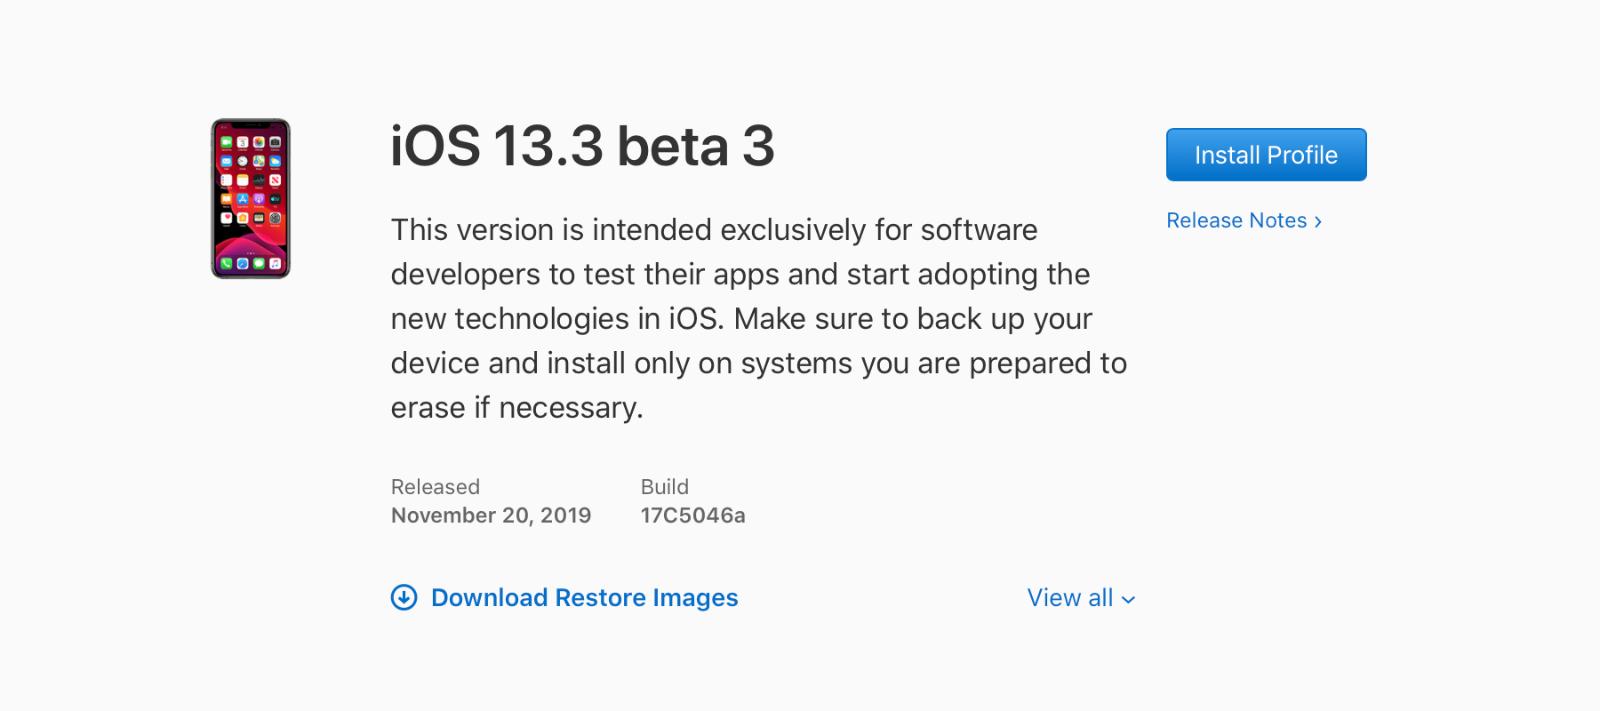 iOS 13.3 beta 3, iPadOS 13.3 beta 3, watchOS 6.1.1 beta 3 y tvOS 13.3 beta 3